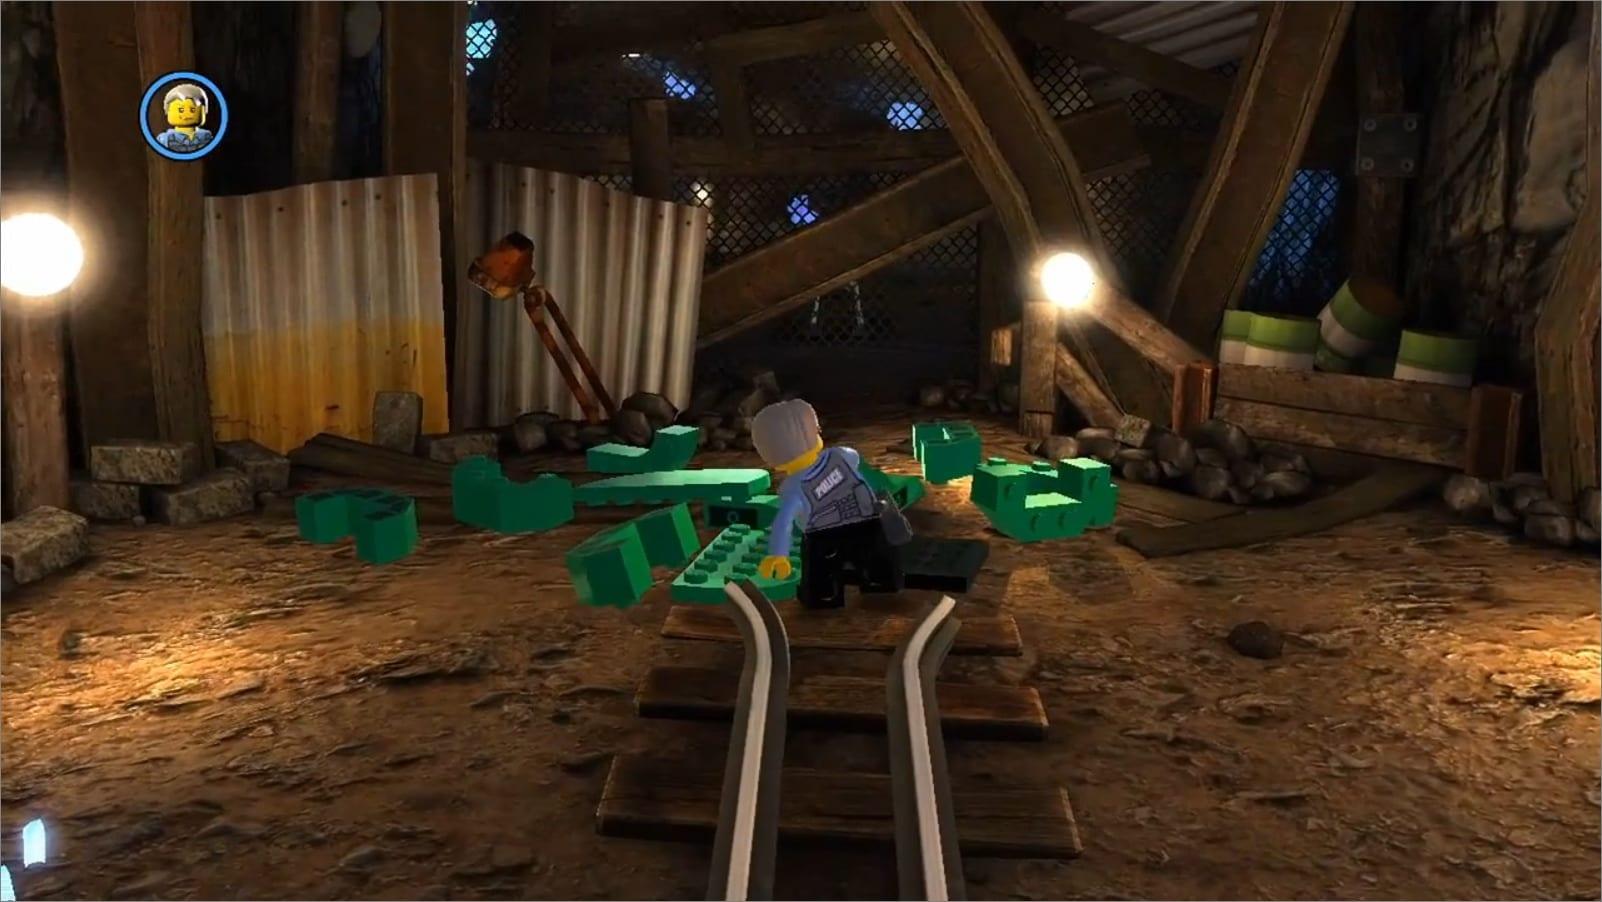 LEGO_City_Undercover_screenshot_39.jpg